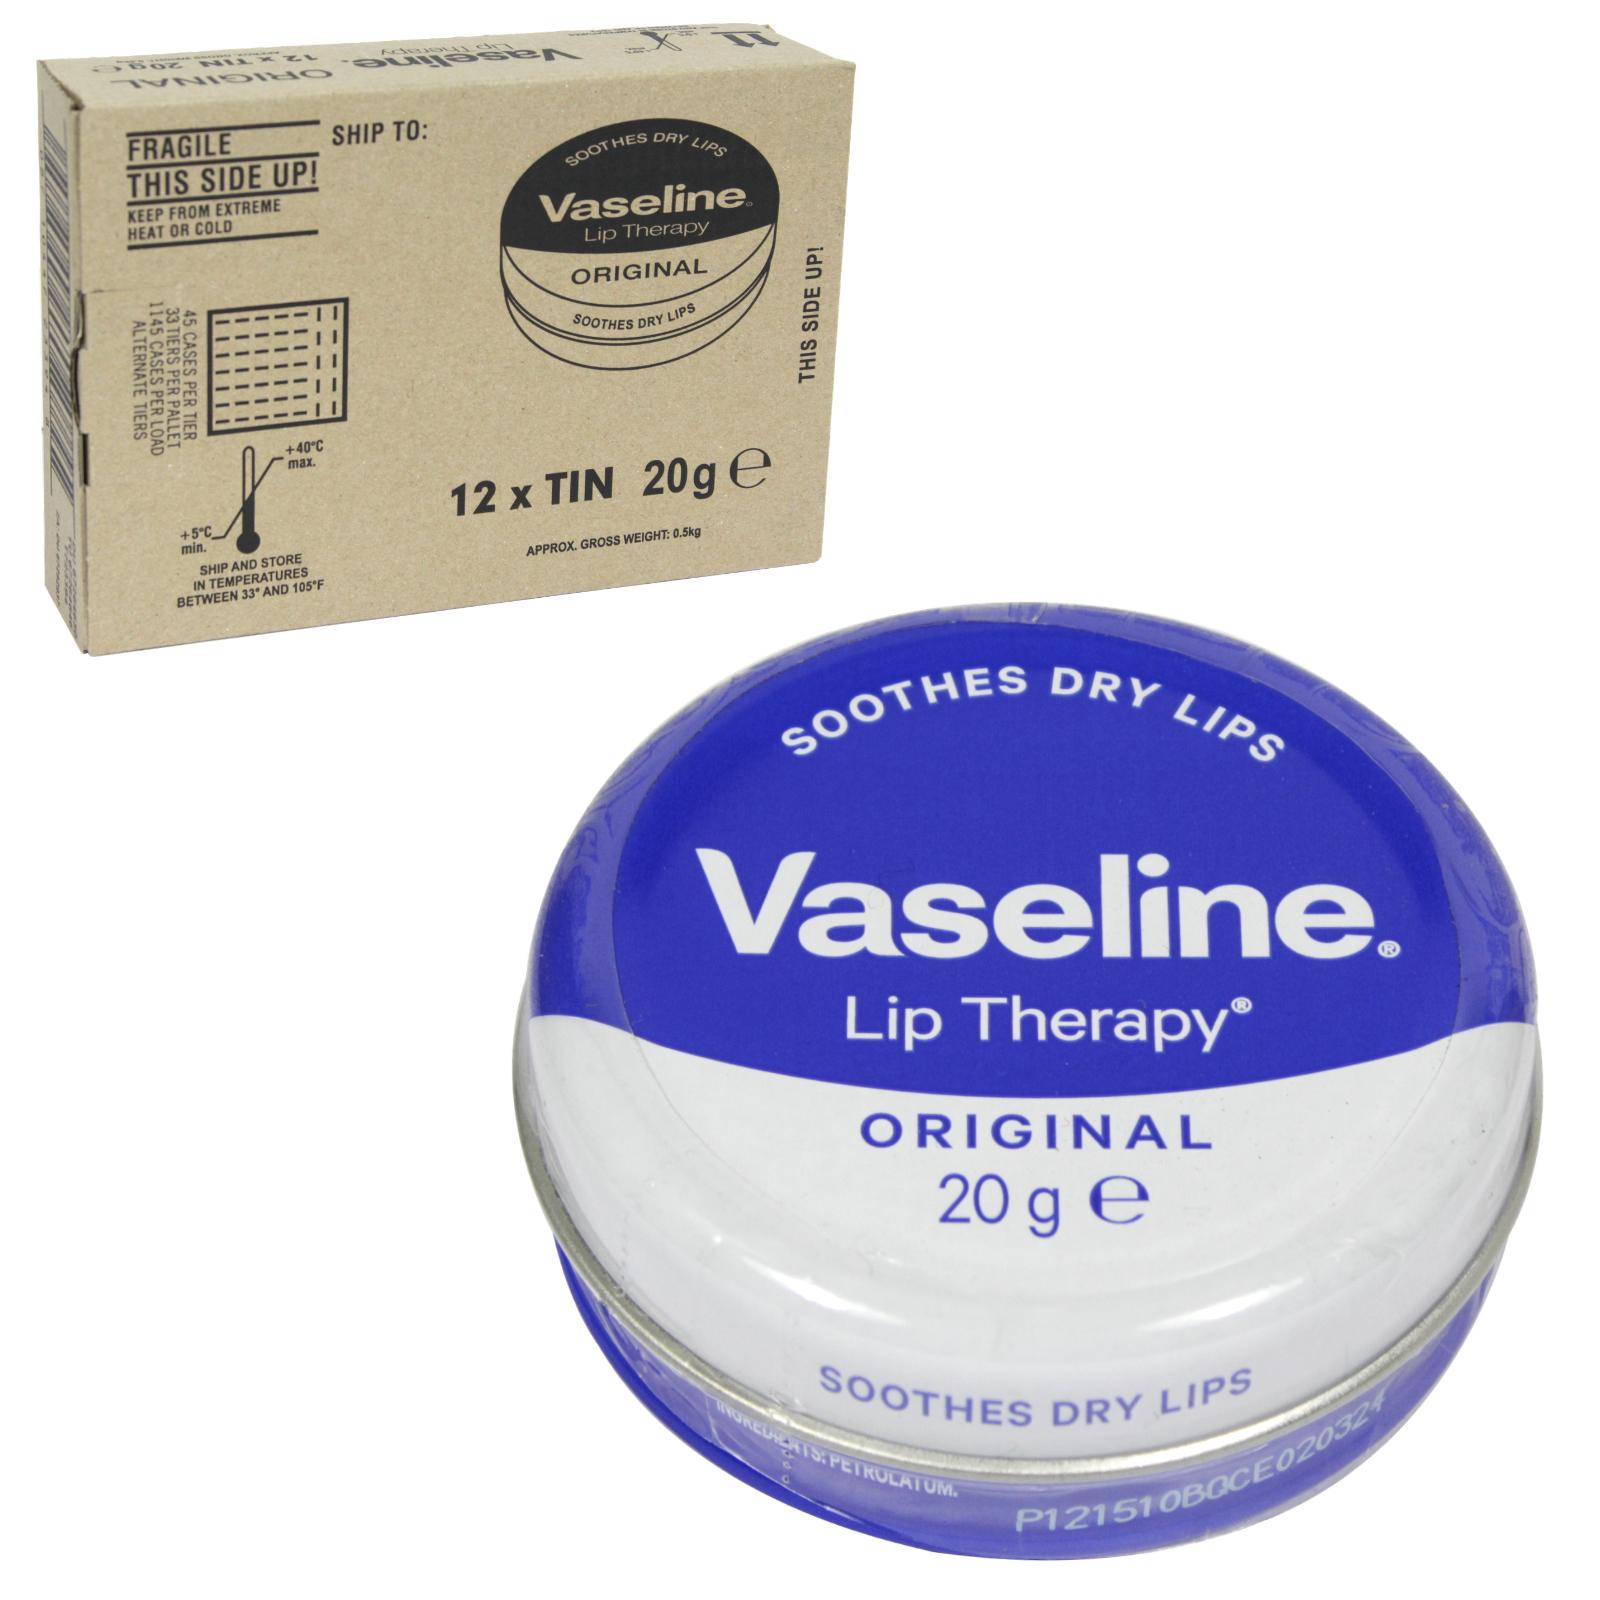 VASELINE LIP THERAPY 20GM ORIGINAL X12